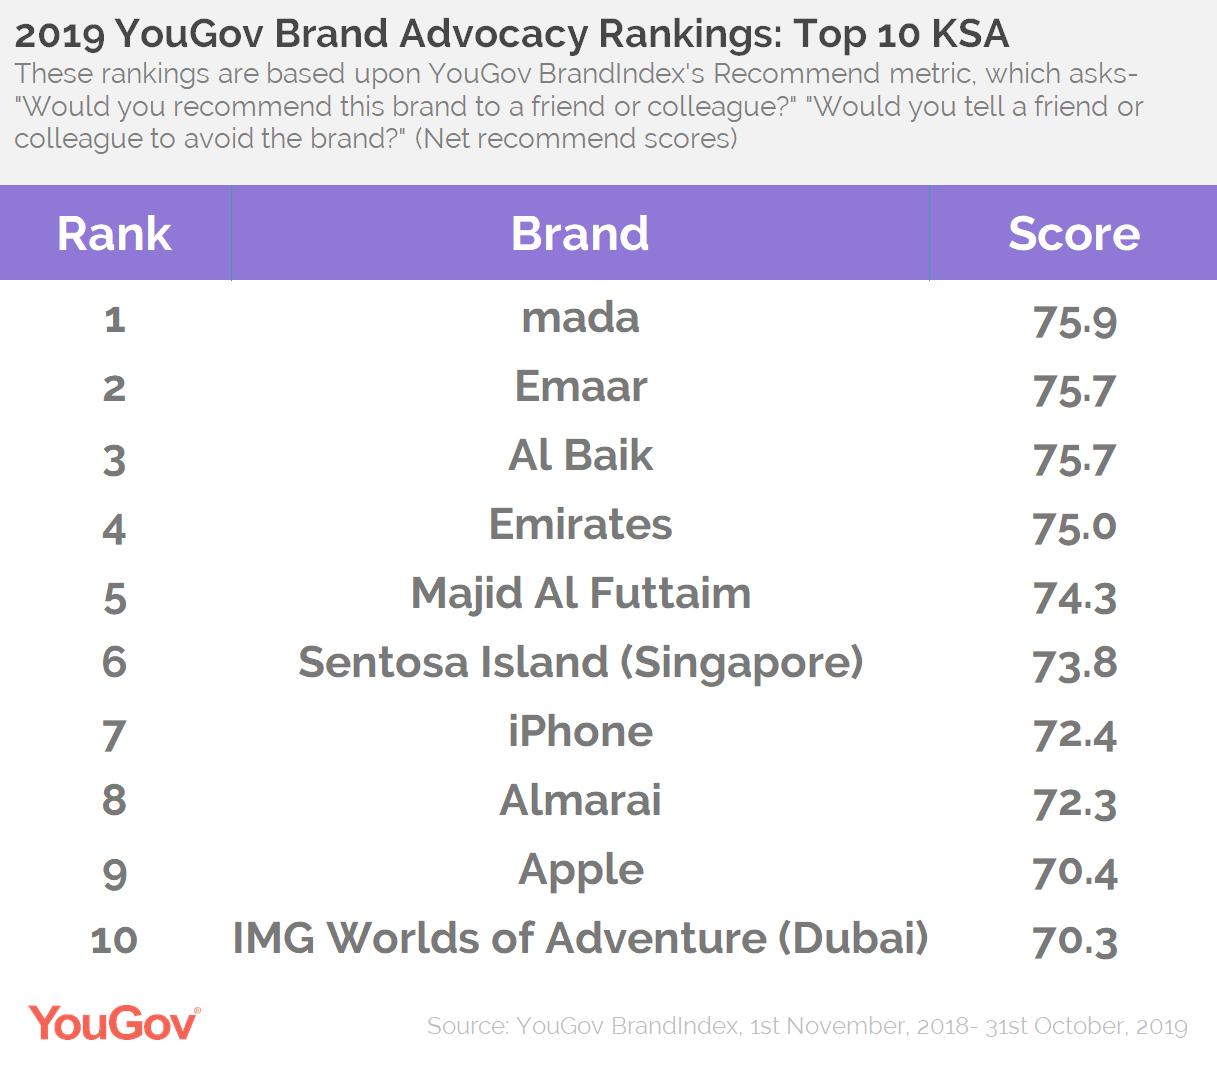 2019 Brand Advocacy Rankings